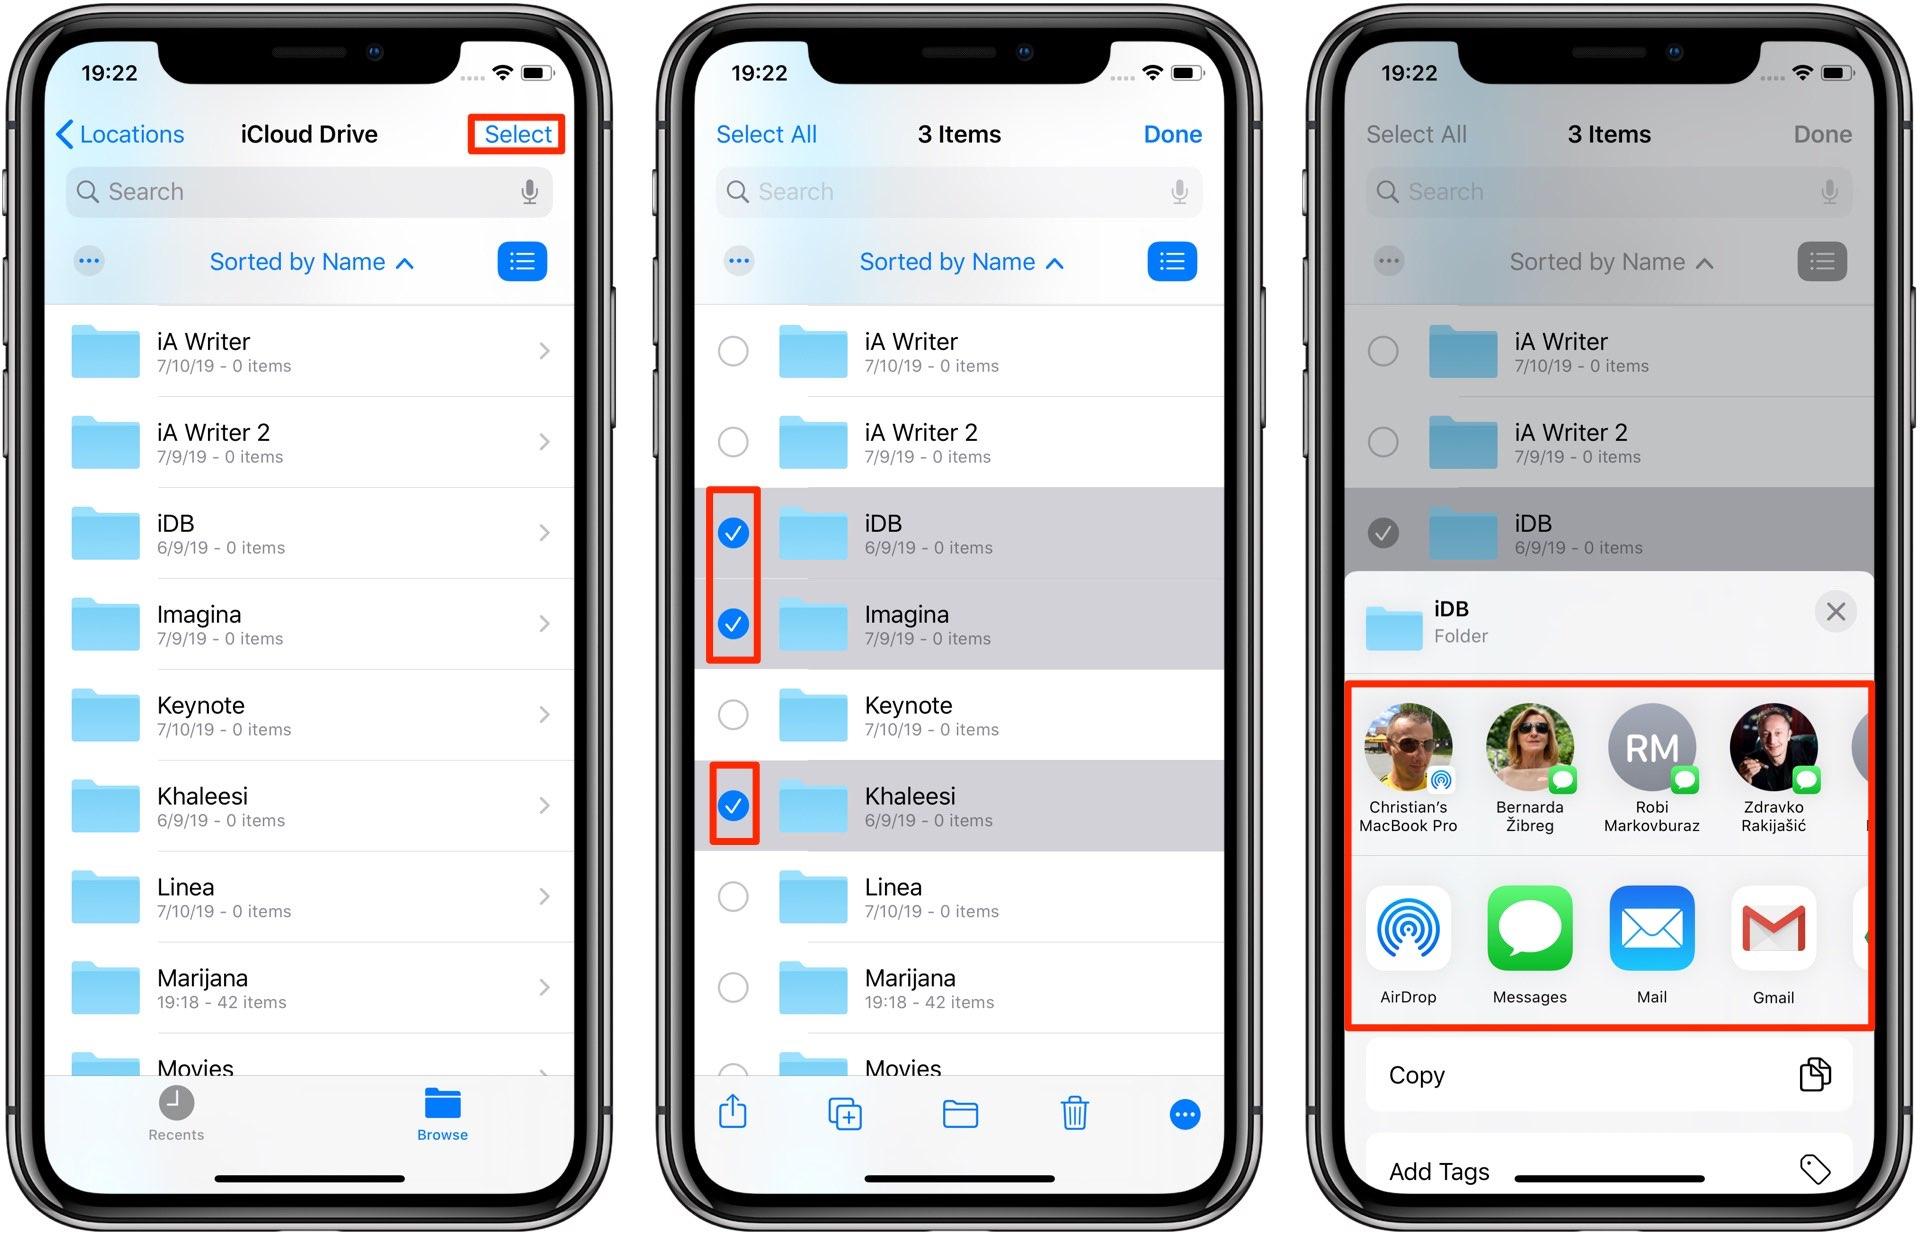 Compartir carpetas de iCloud Drive - iPhone multiple